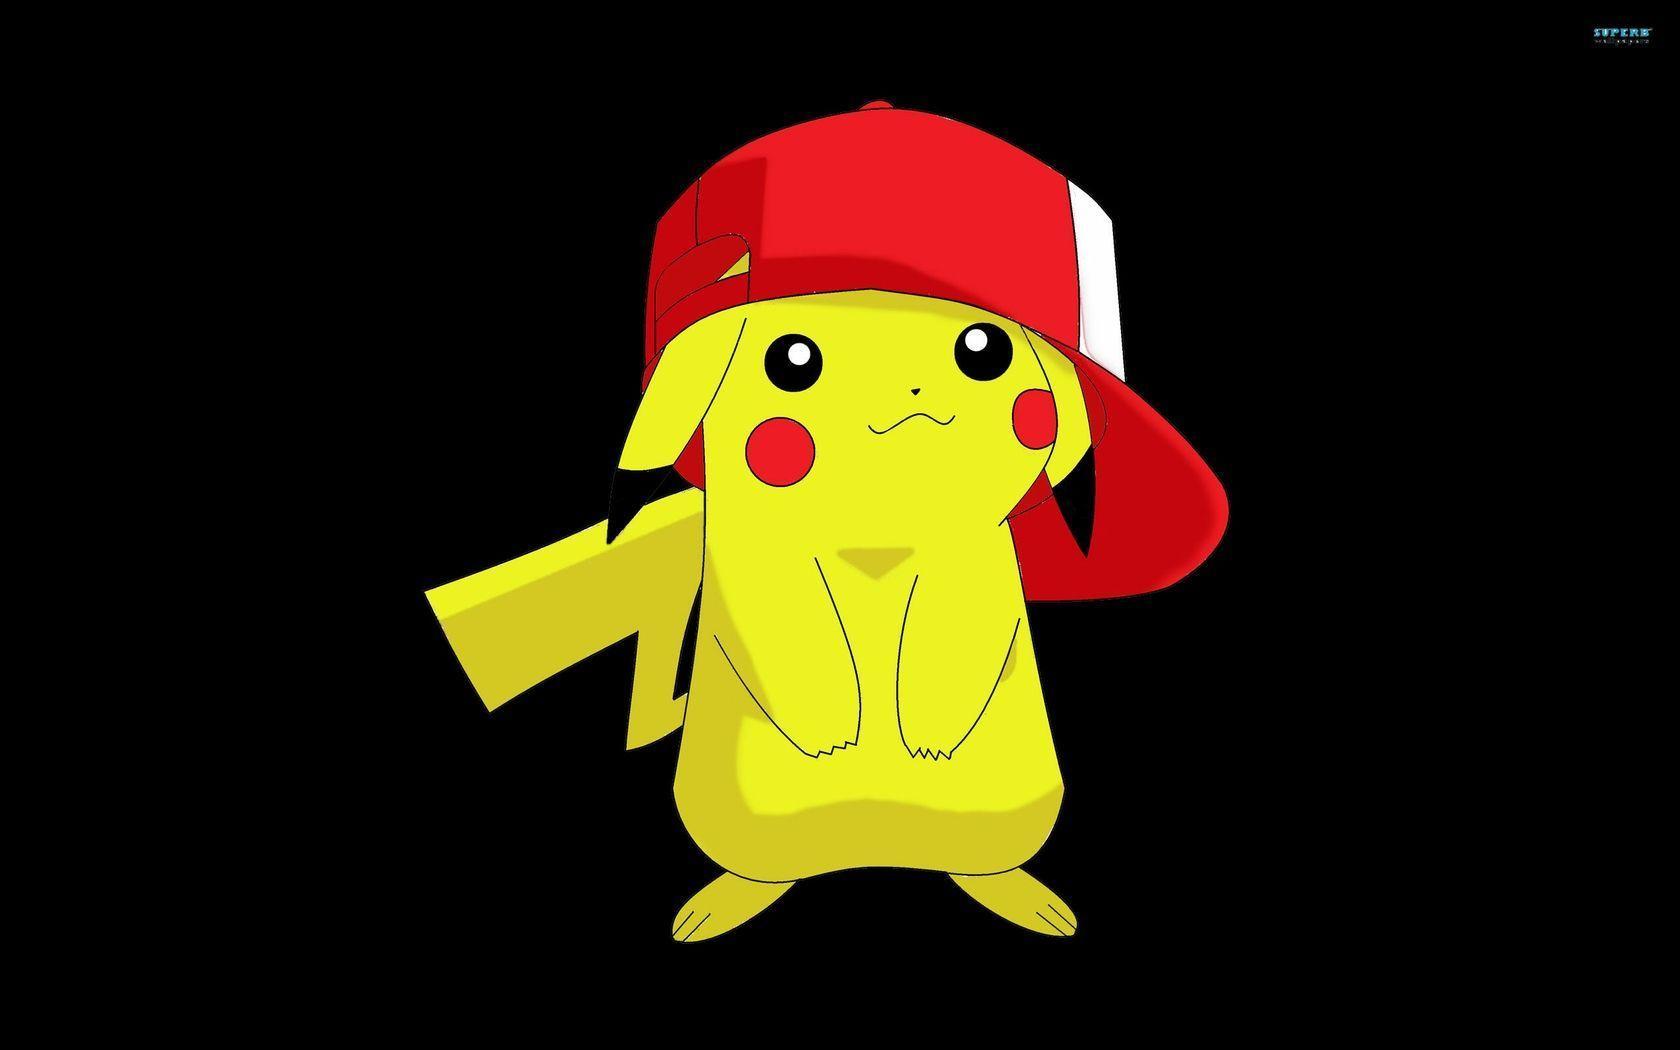 "1680x1050 Pikachu Wallpaper 132 Go - Not Go Away""> · Download · 1600x900 Pikachu Wallpaper ..."